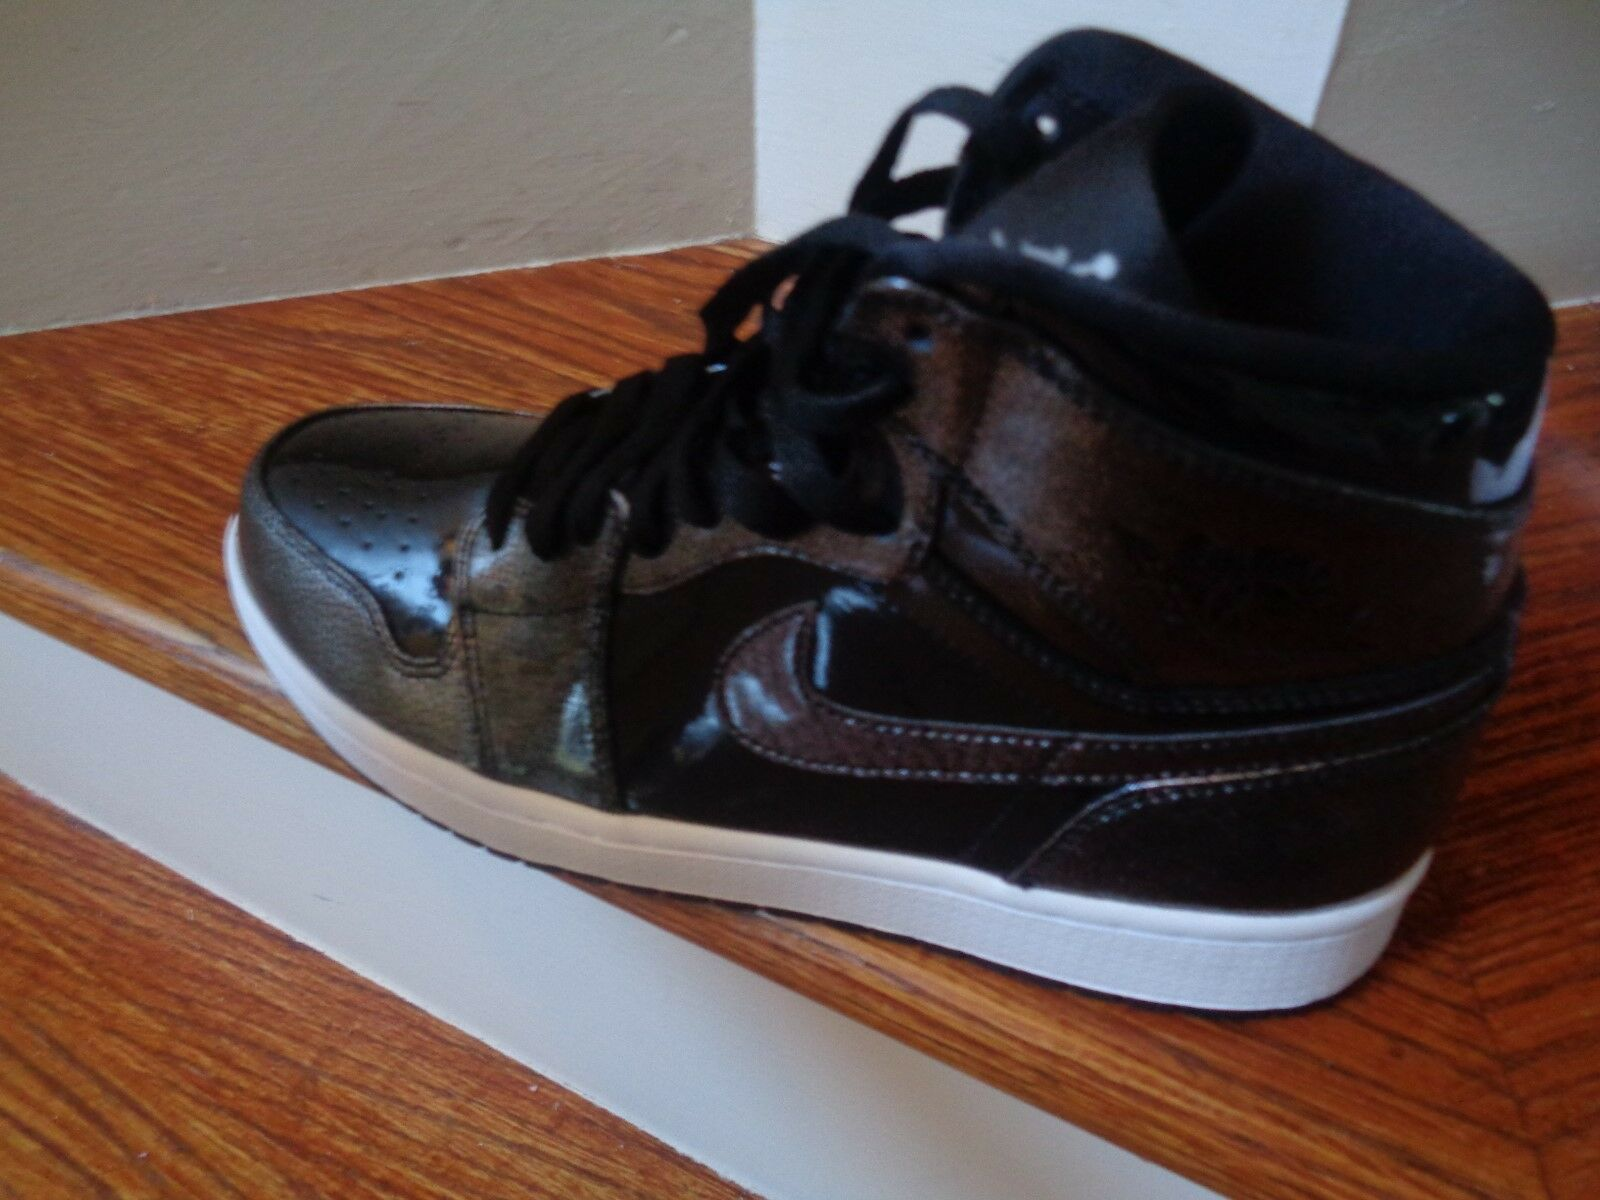 Nike Air Jordan 1 Retro High Men's Basket Ball Shoes, 332550 017 Size 10.5 NEW